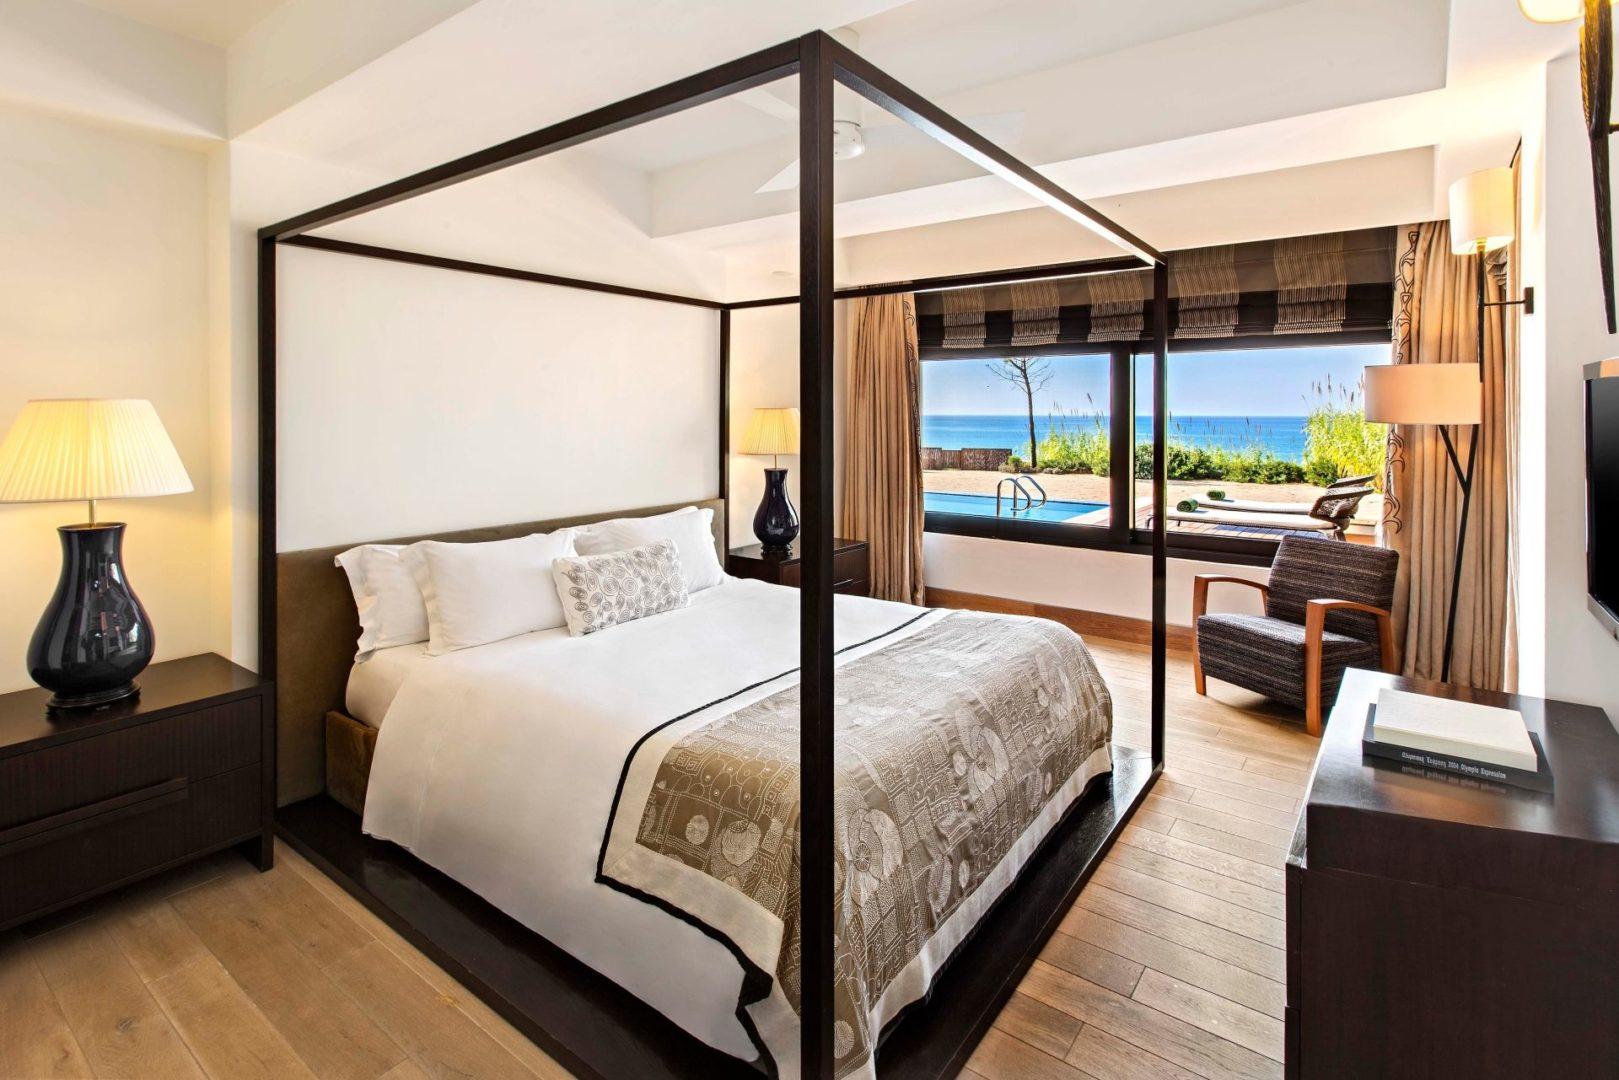 Ithomi – Sapientza Master bedroom